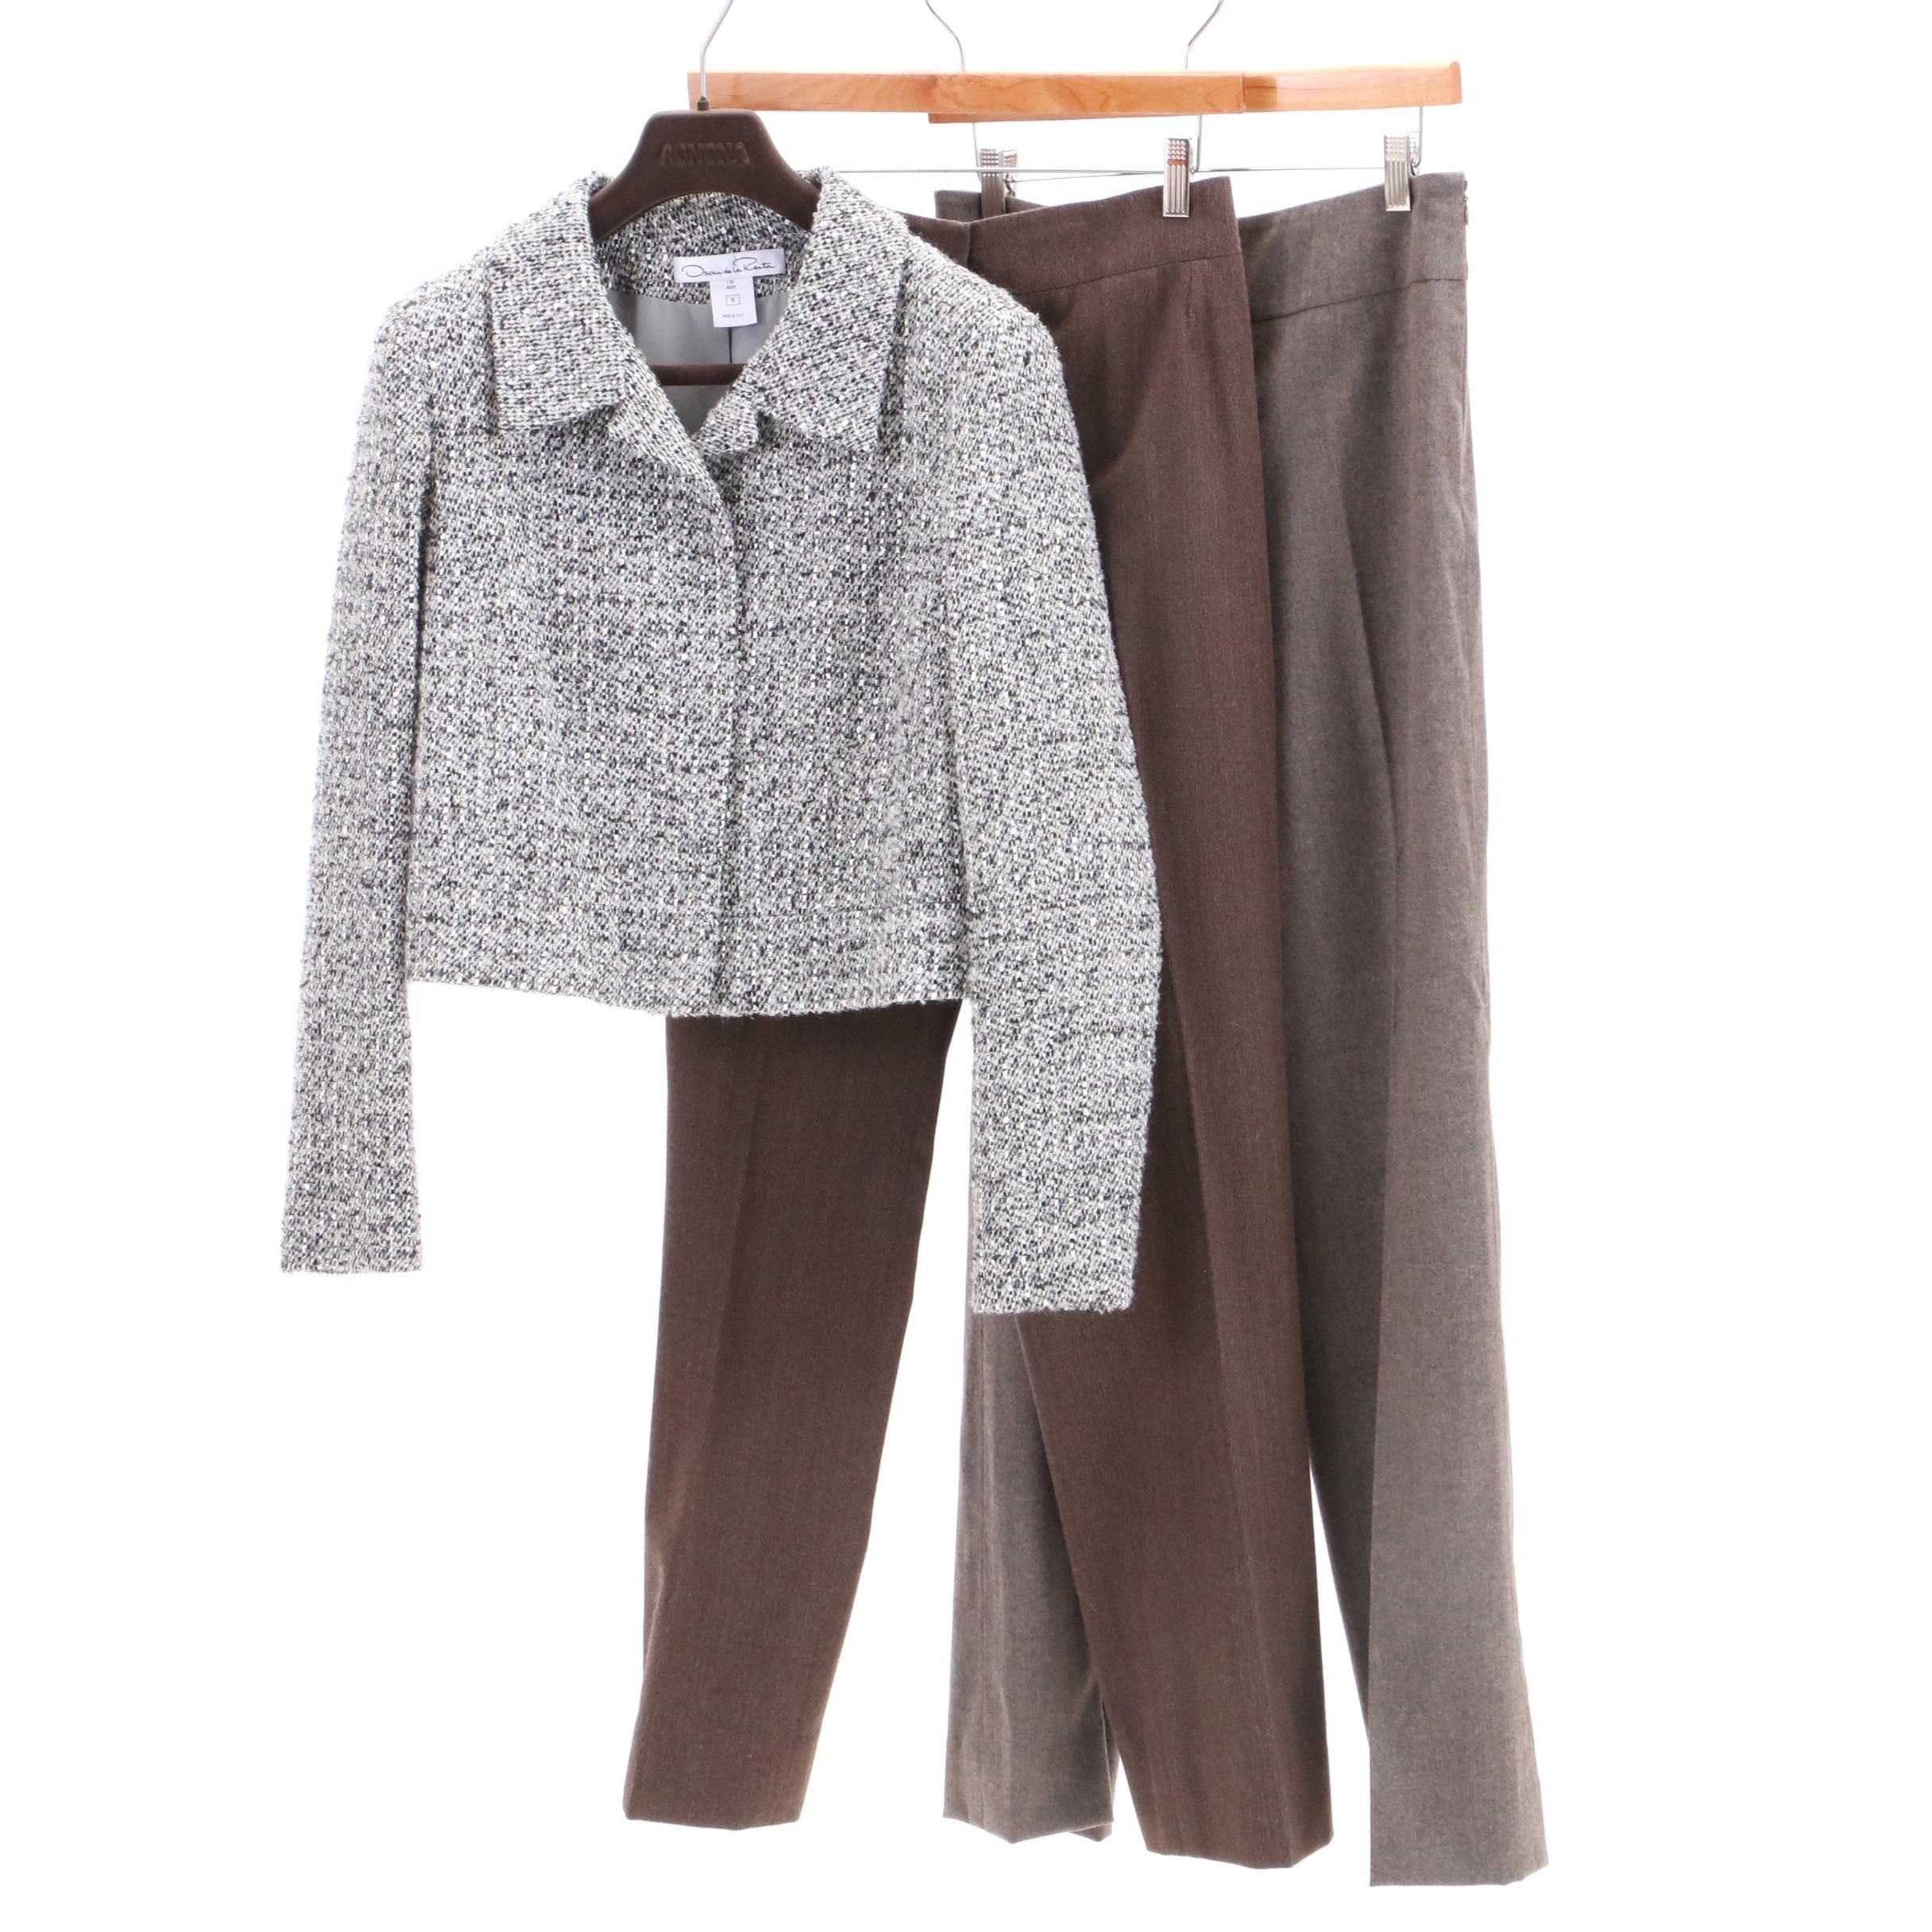 Oscar de la Renta Bouclé Jacket and Wool Blend Trousers